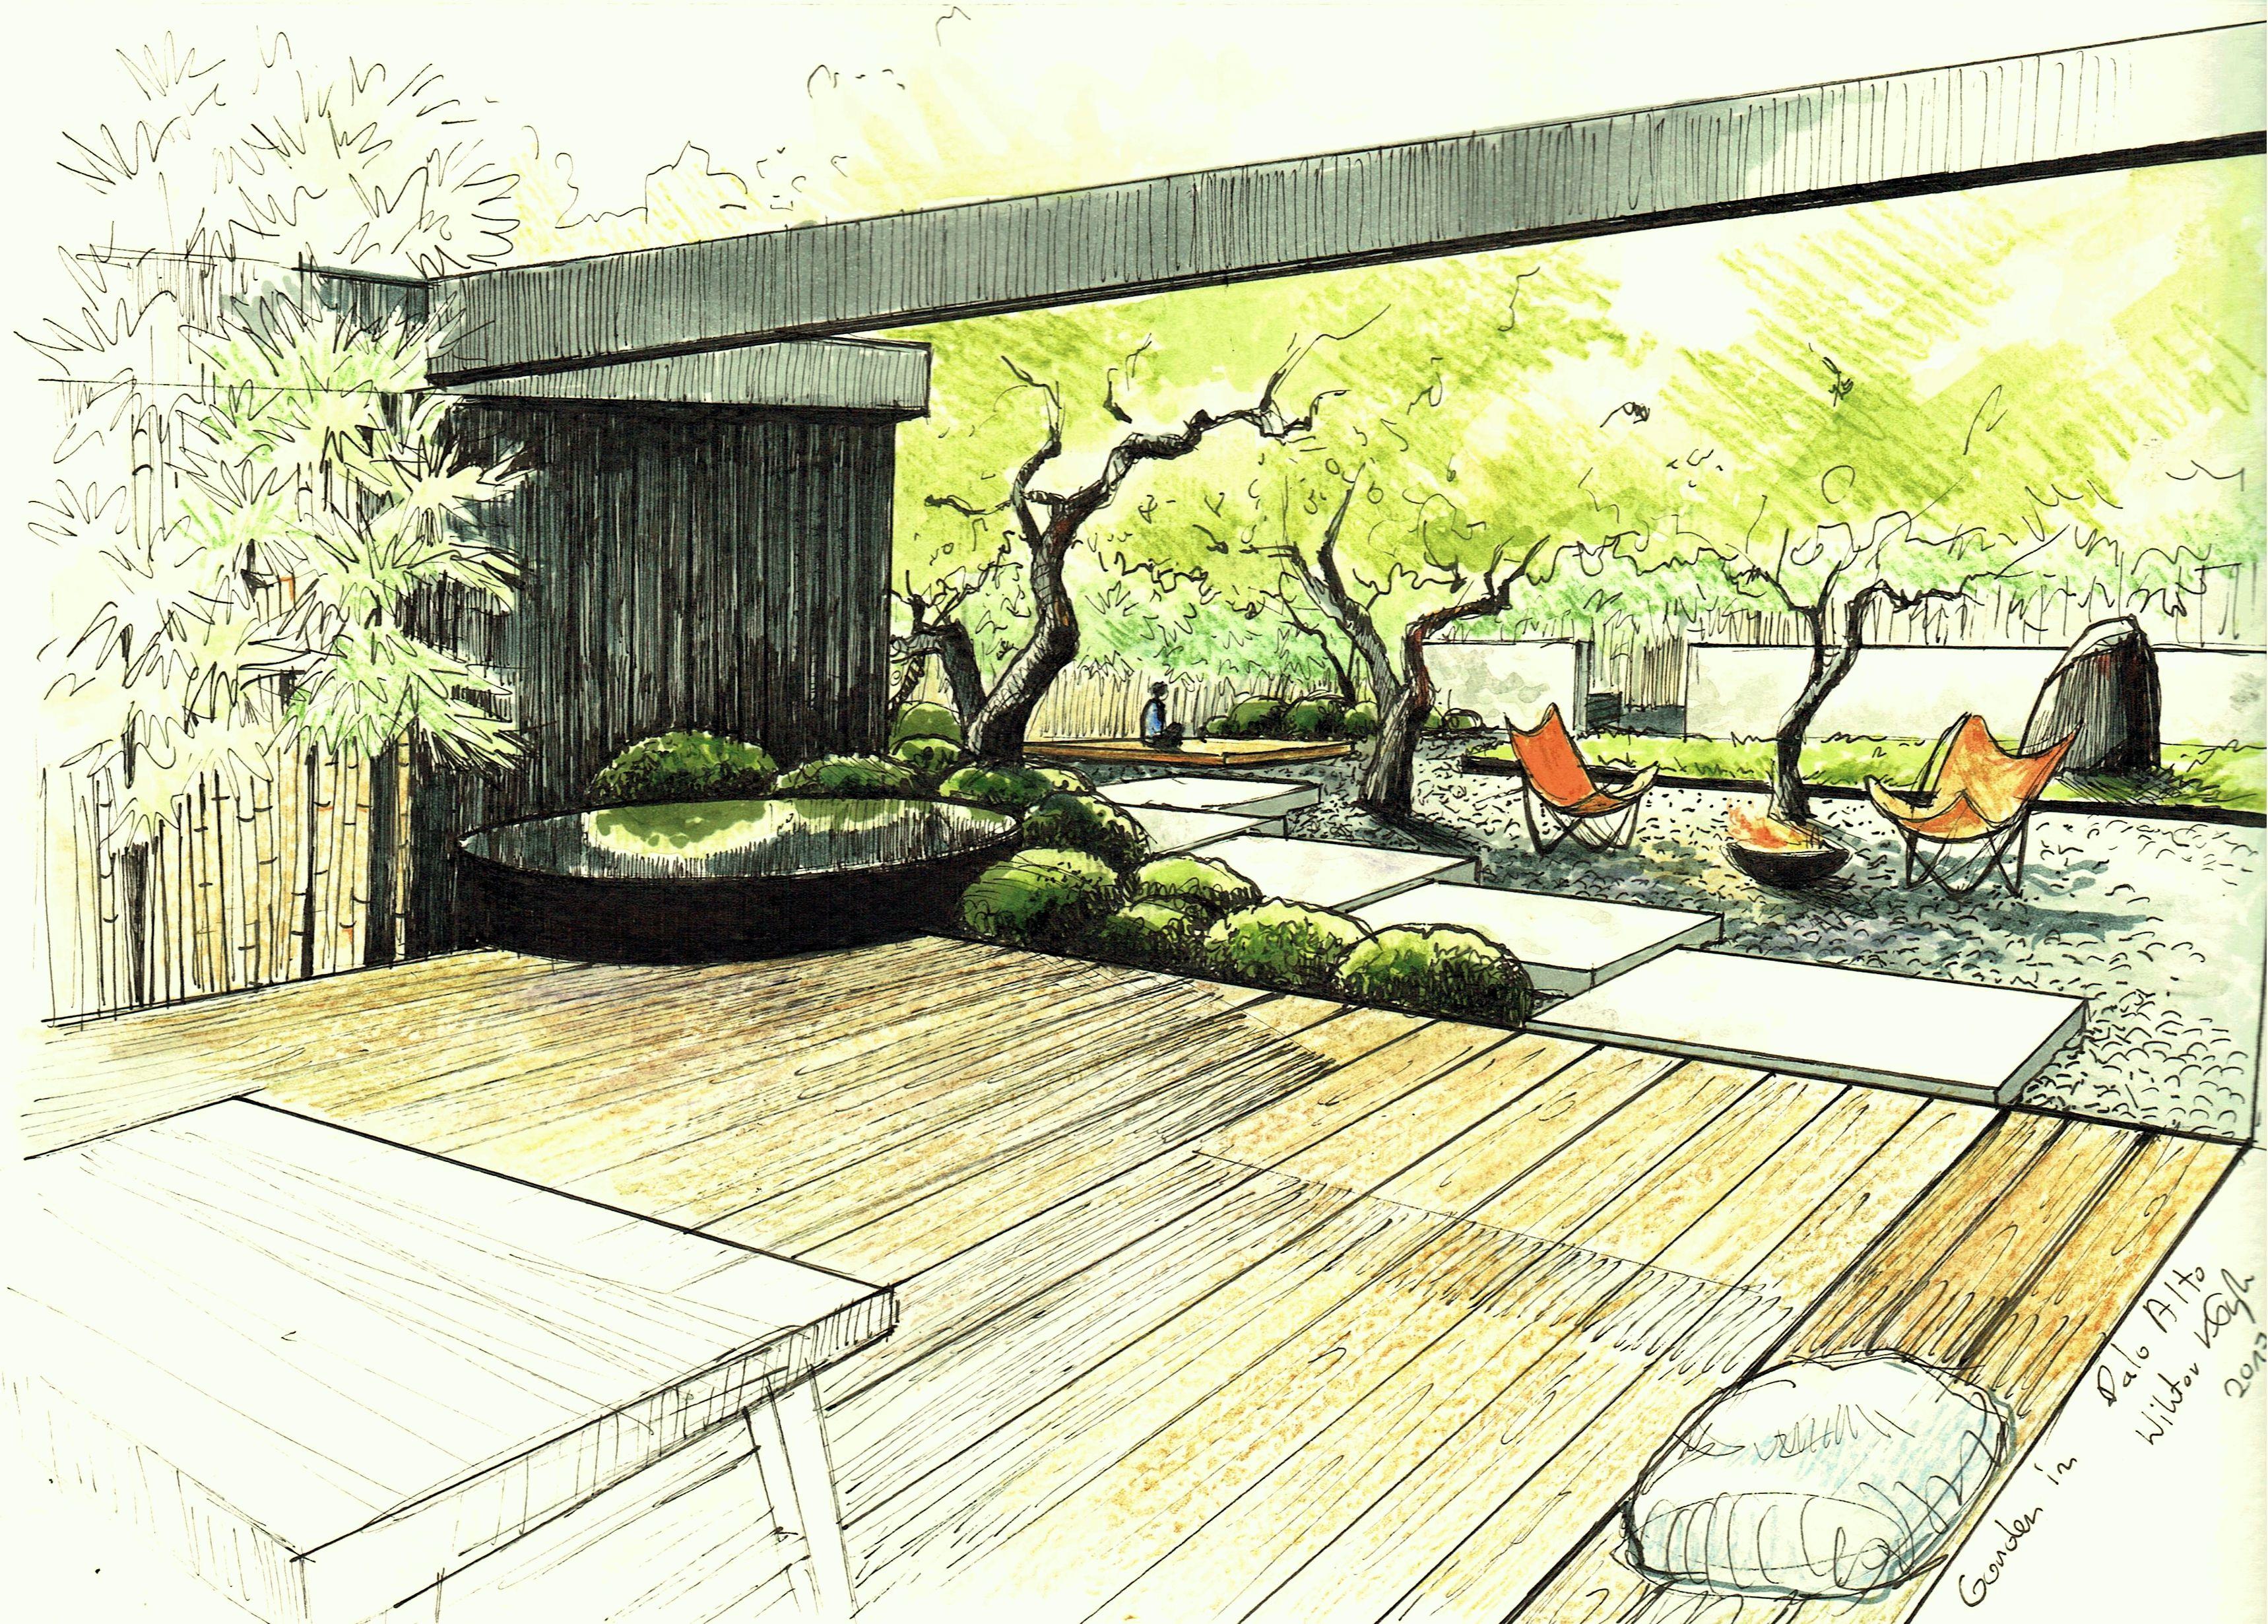 Zen Garden in California by Wiktor Kłyk.